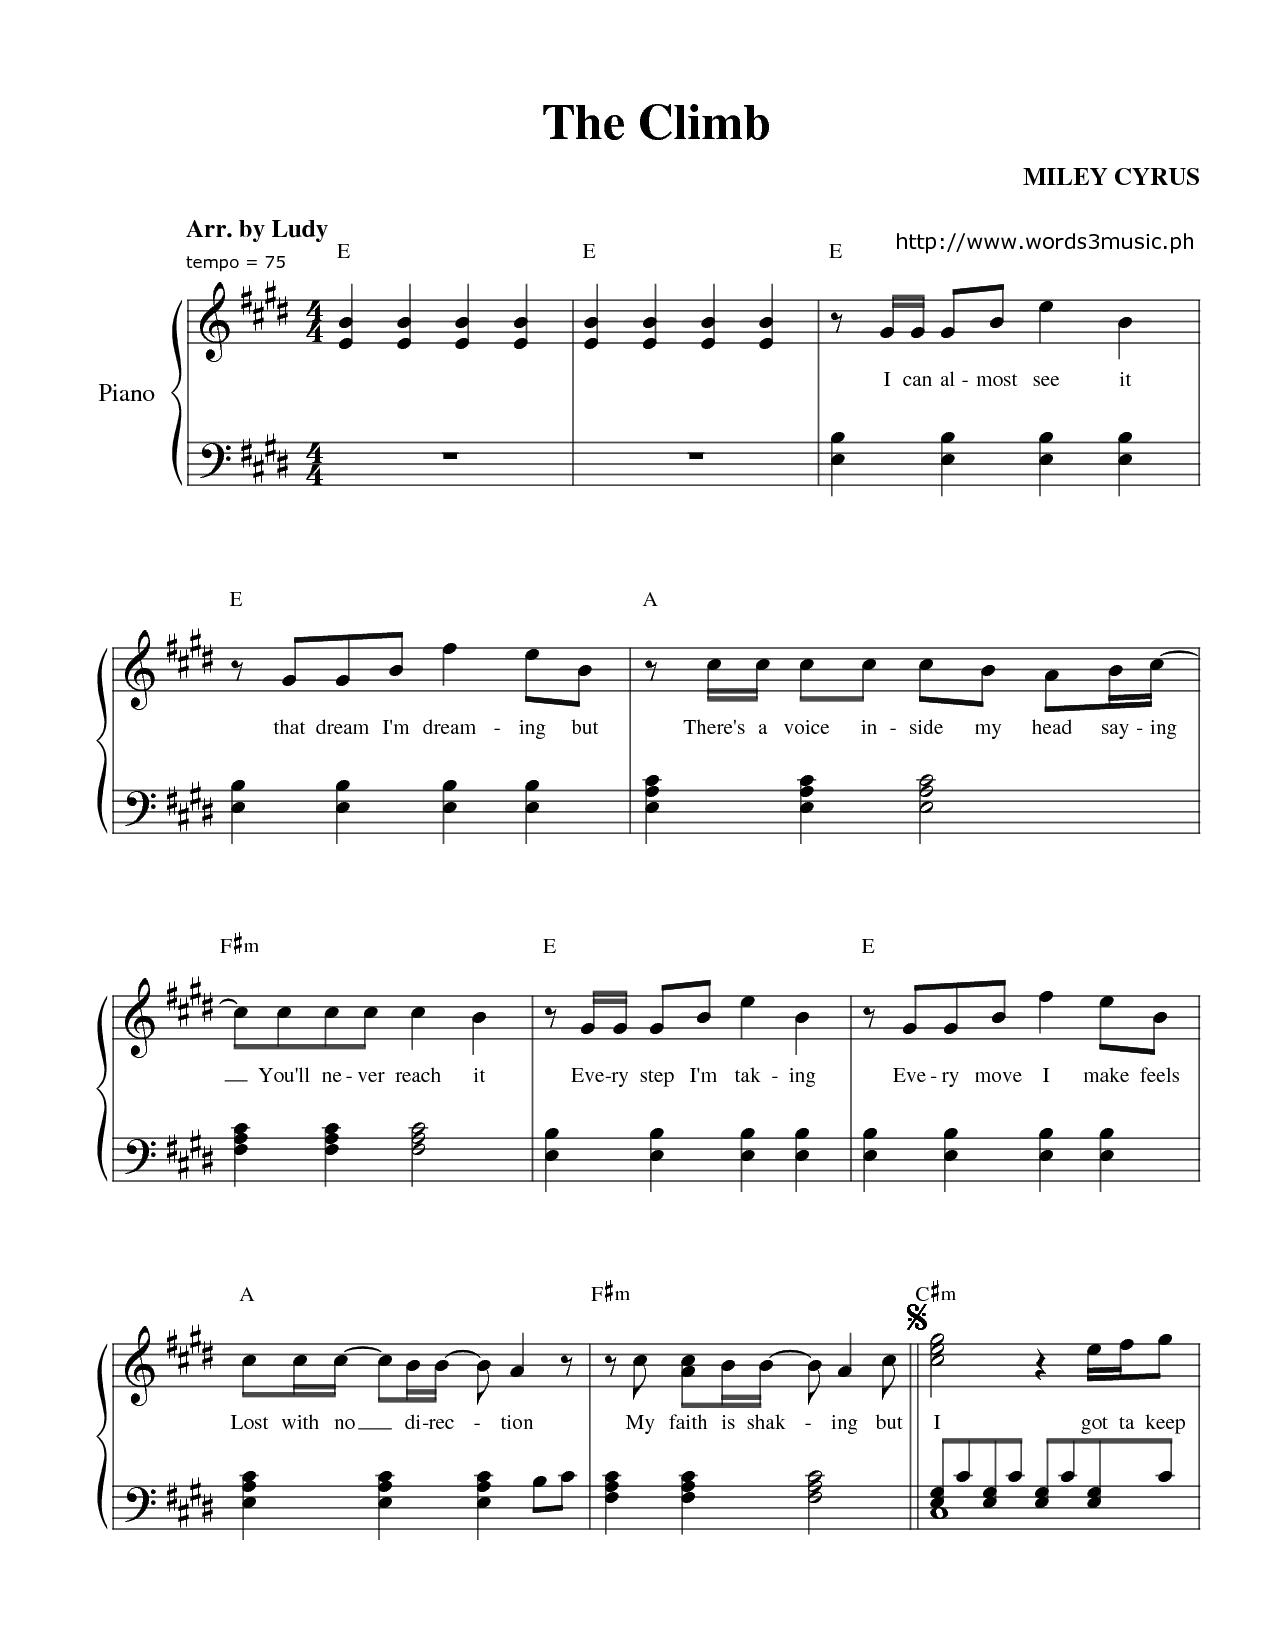 Miley Cyrus The Climb Sheet Music Piano Sheet Music Free Piano Sheet Music